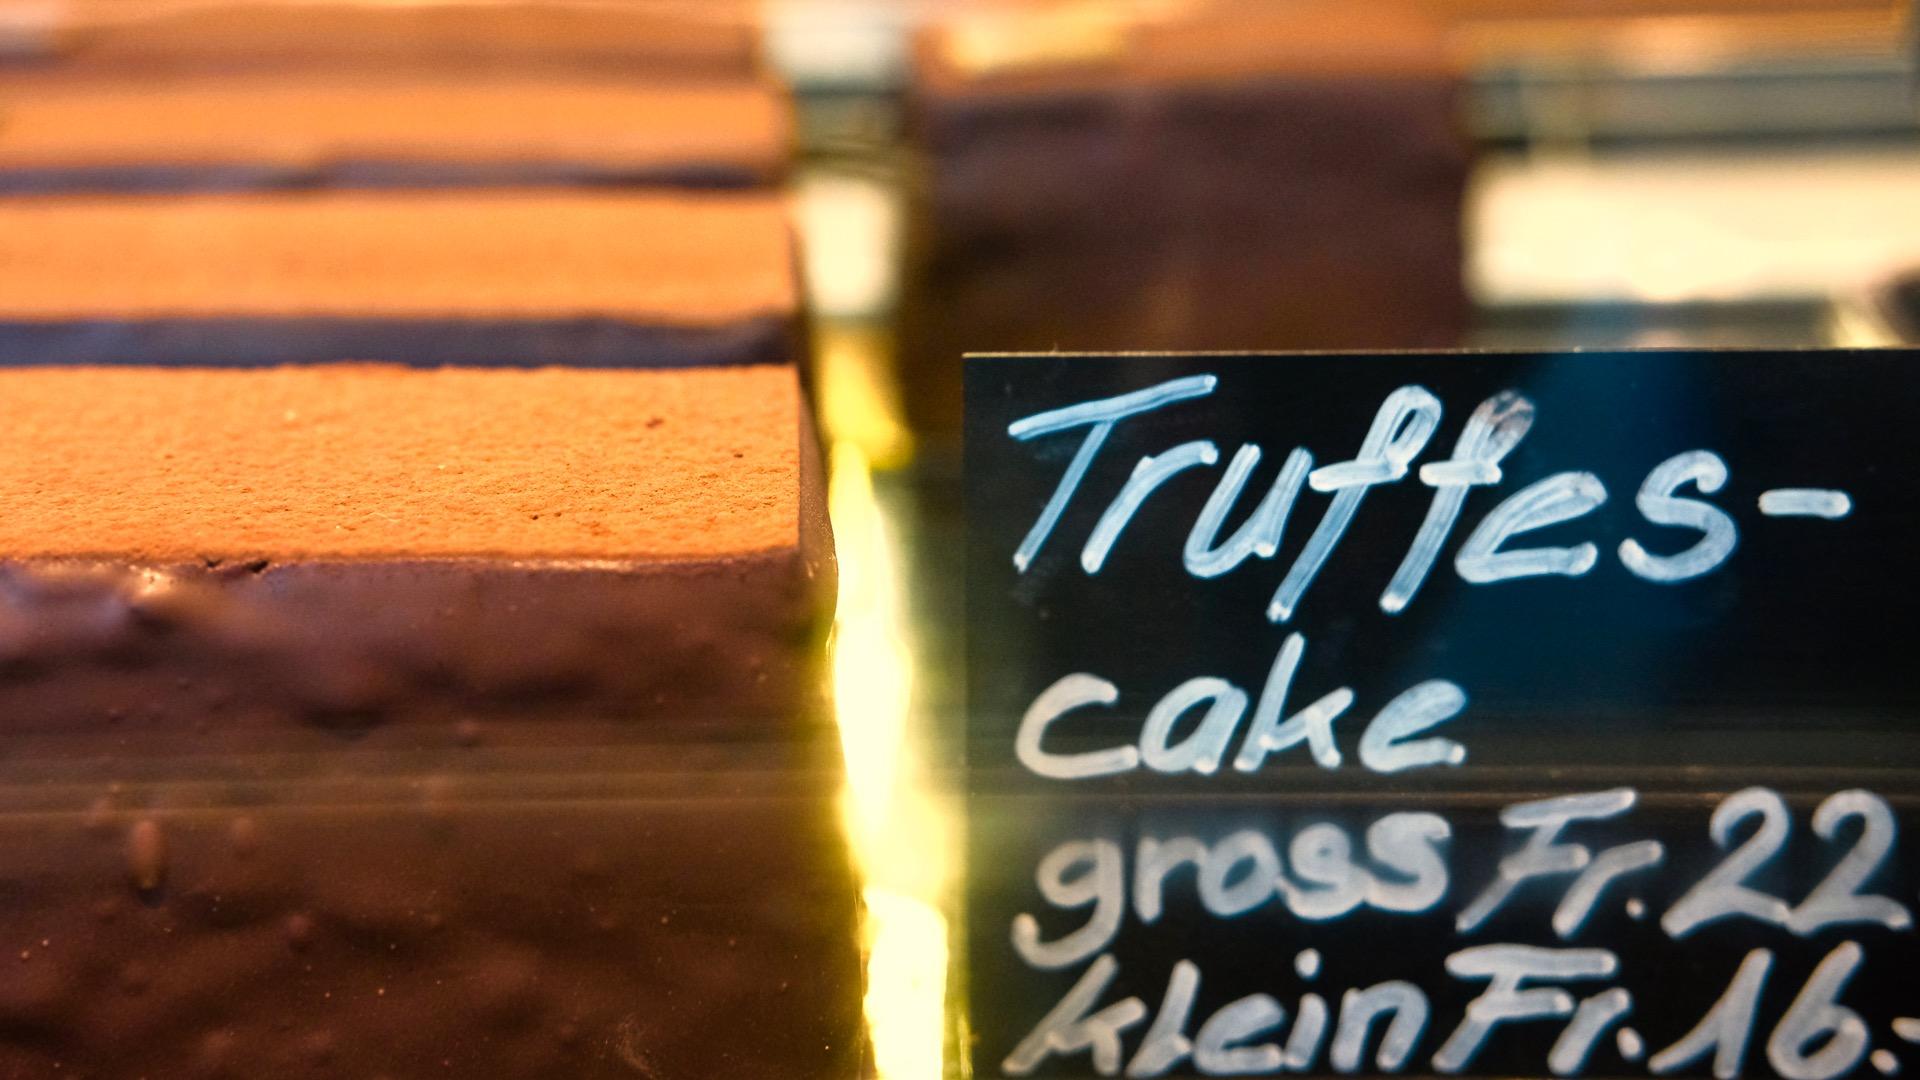 truffes-cake-switzerland-berne